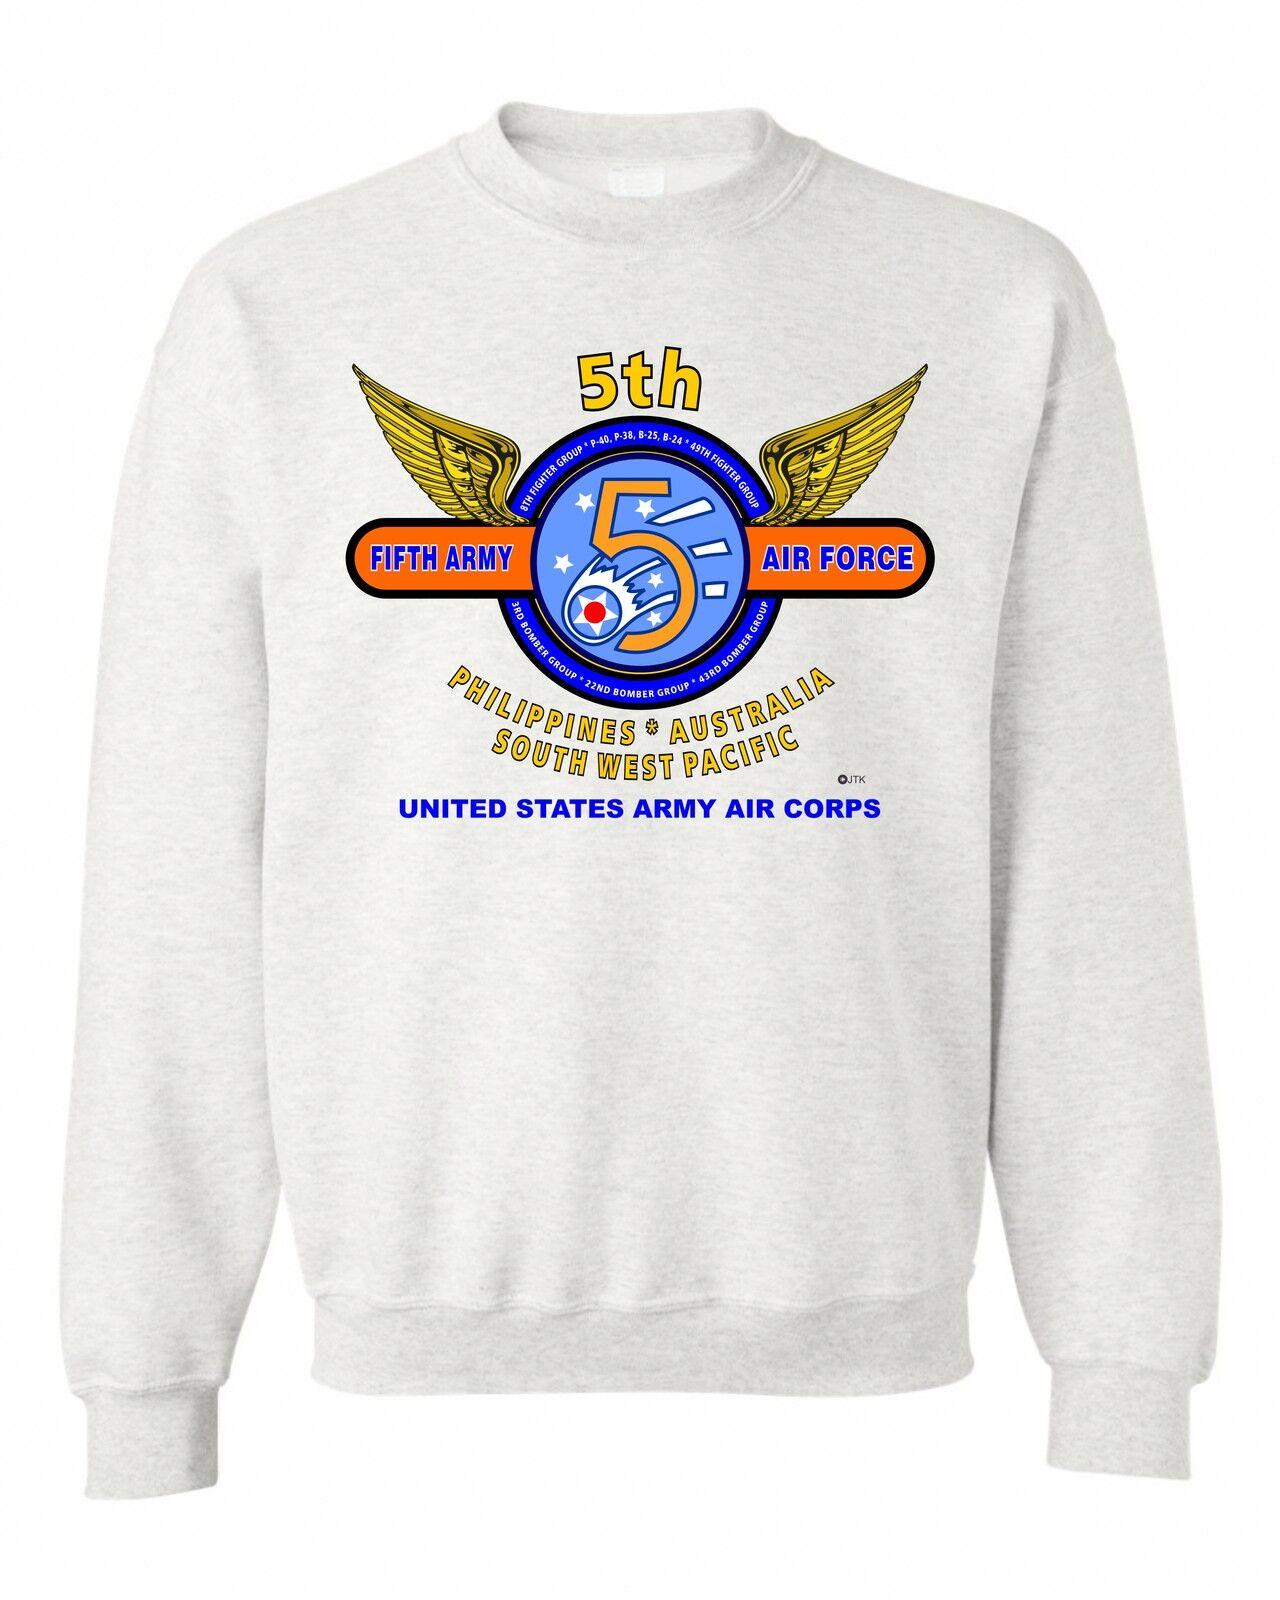 5TH ARMY AIR FORCE